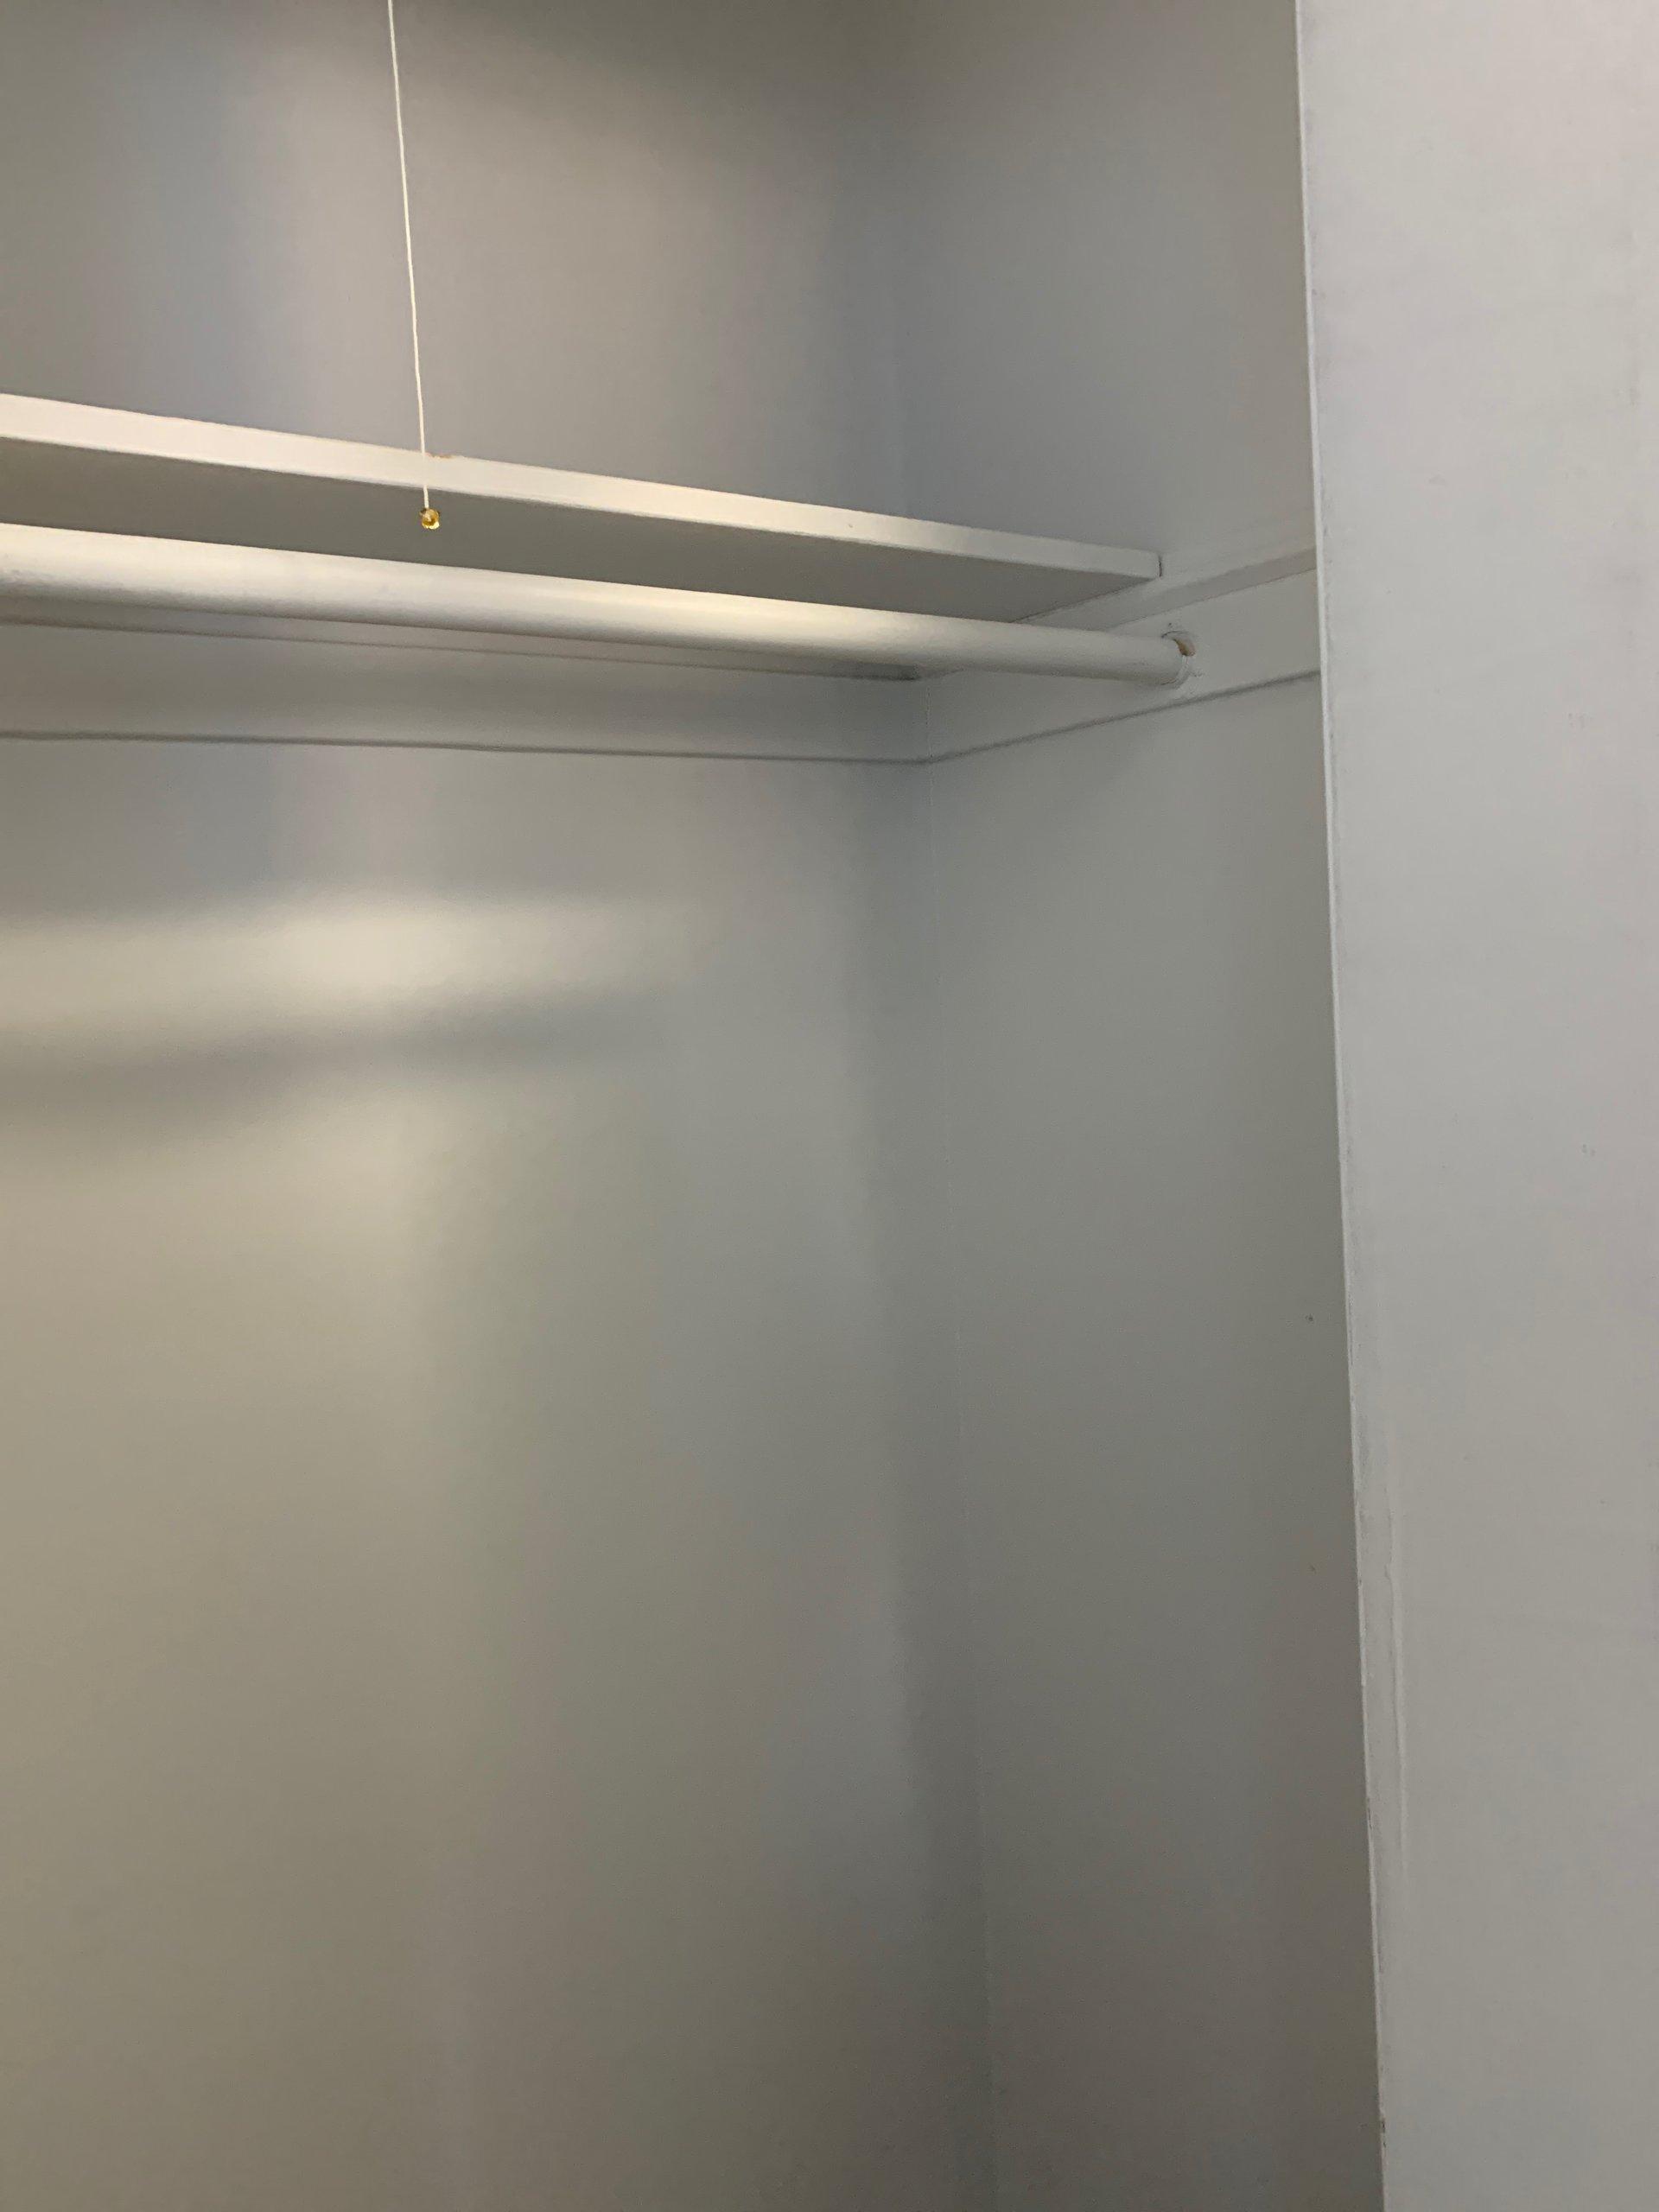 15x6 Closet self storage unit